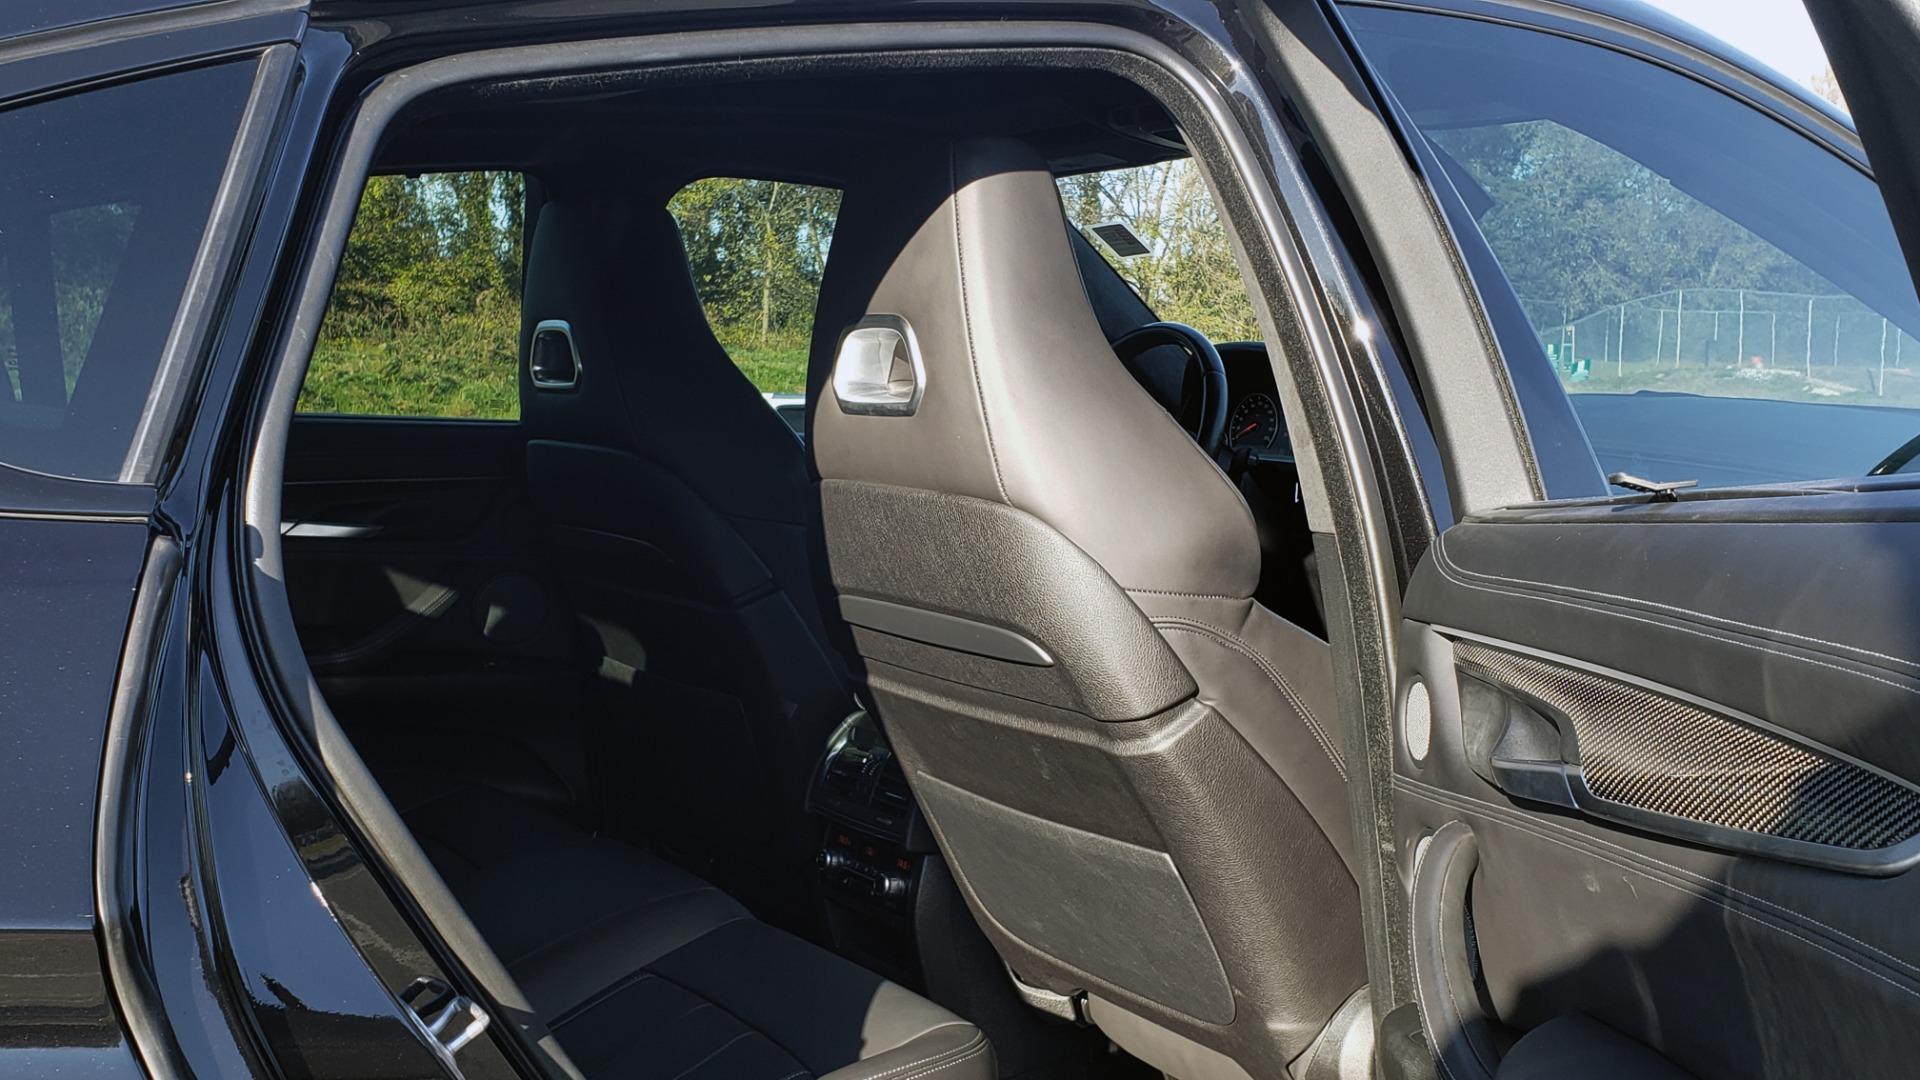 Used 2016 BMW X6 M EXEC PKG / DRVR ASST / NAV / SUNROOF / BLIND SPOT / REARVIEW for sale Sold at Formula Imports in Charlotte NC 28227 81